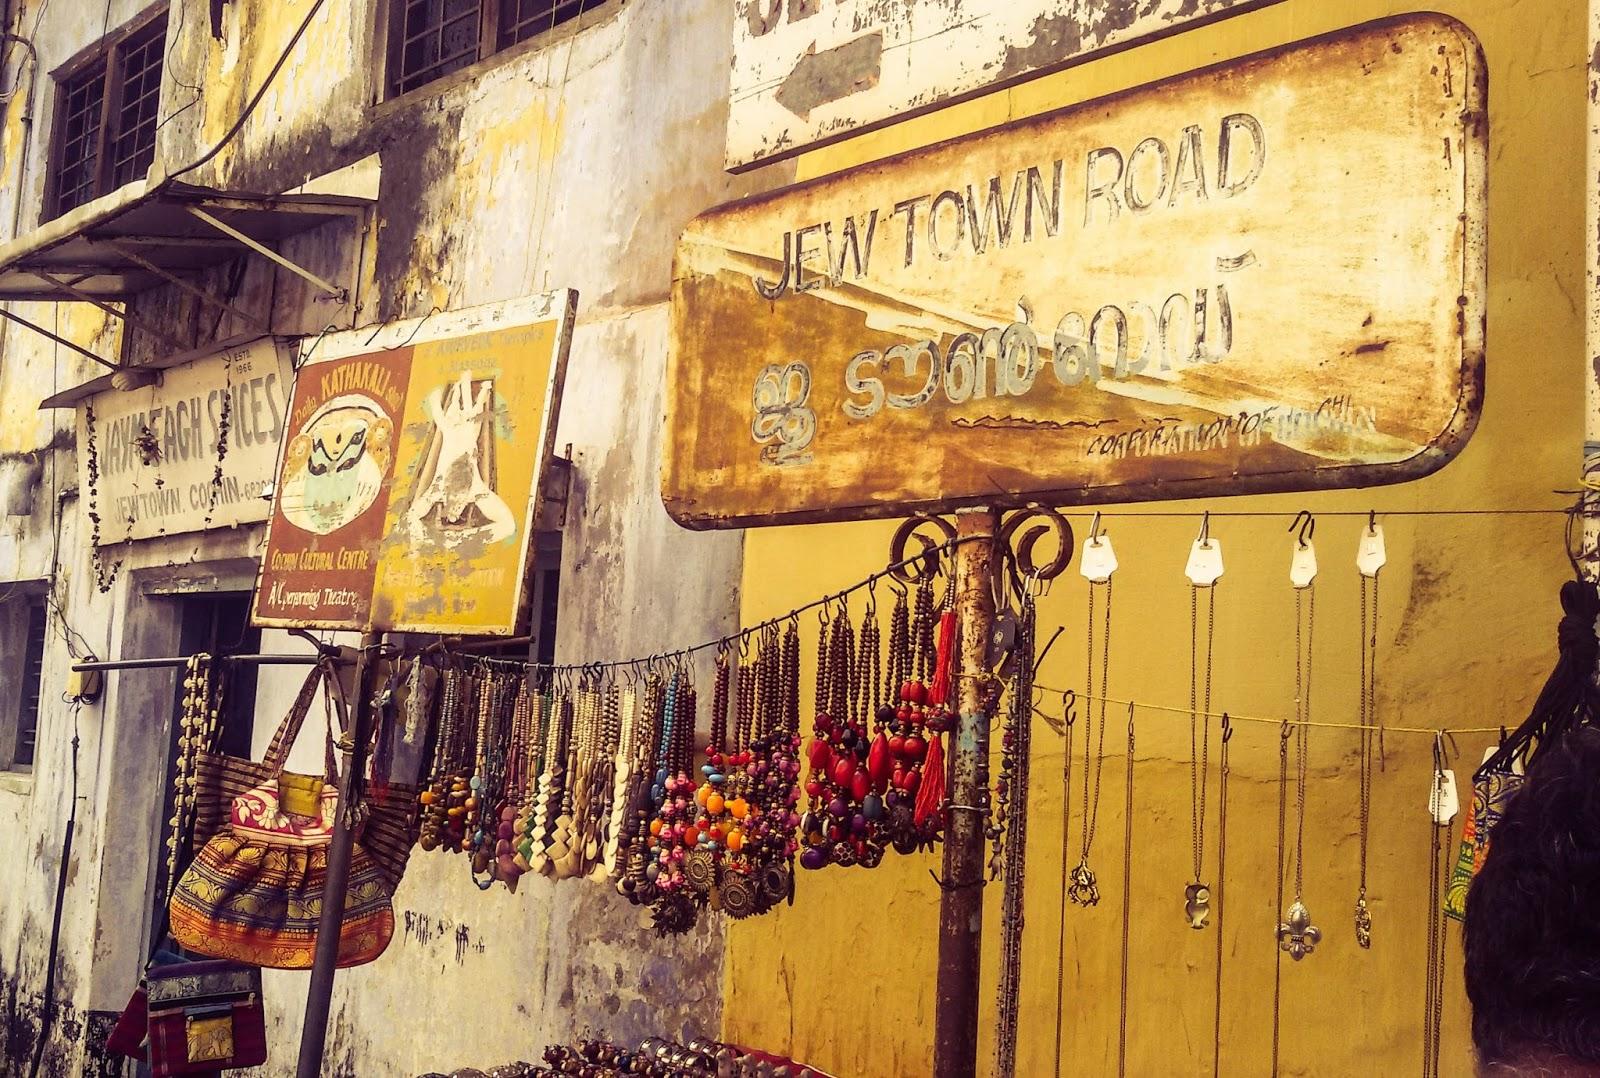 A day in Jew Town (Kochi) - Pop of Joy